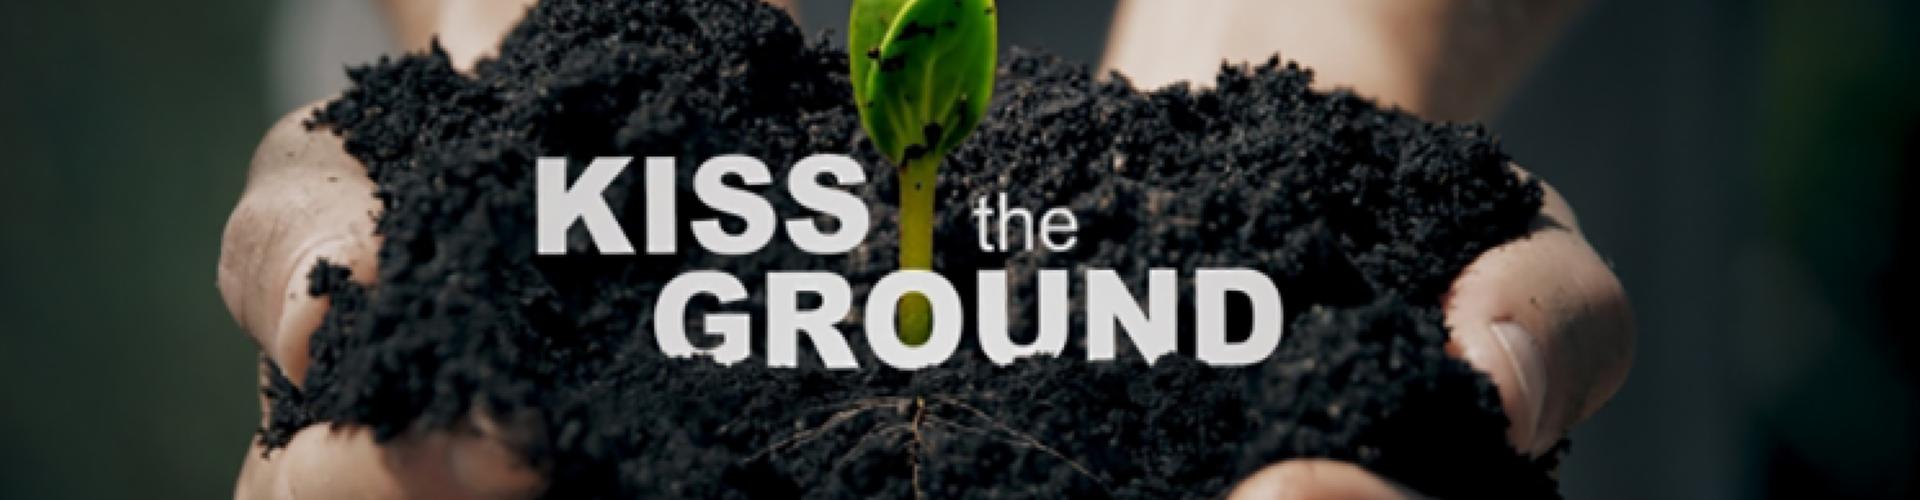 slider-kiss-the-ground